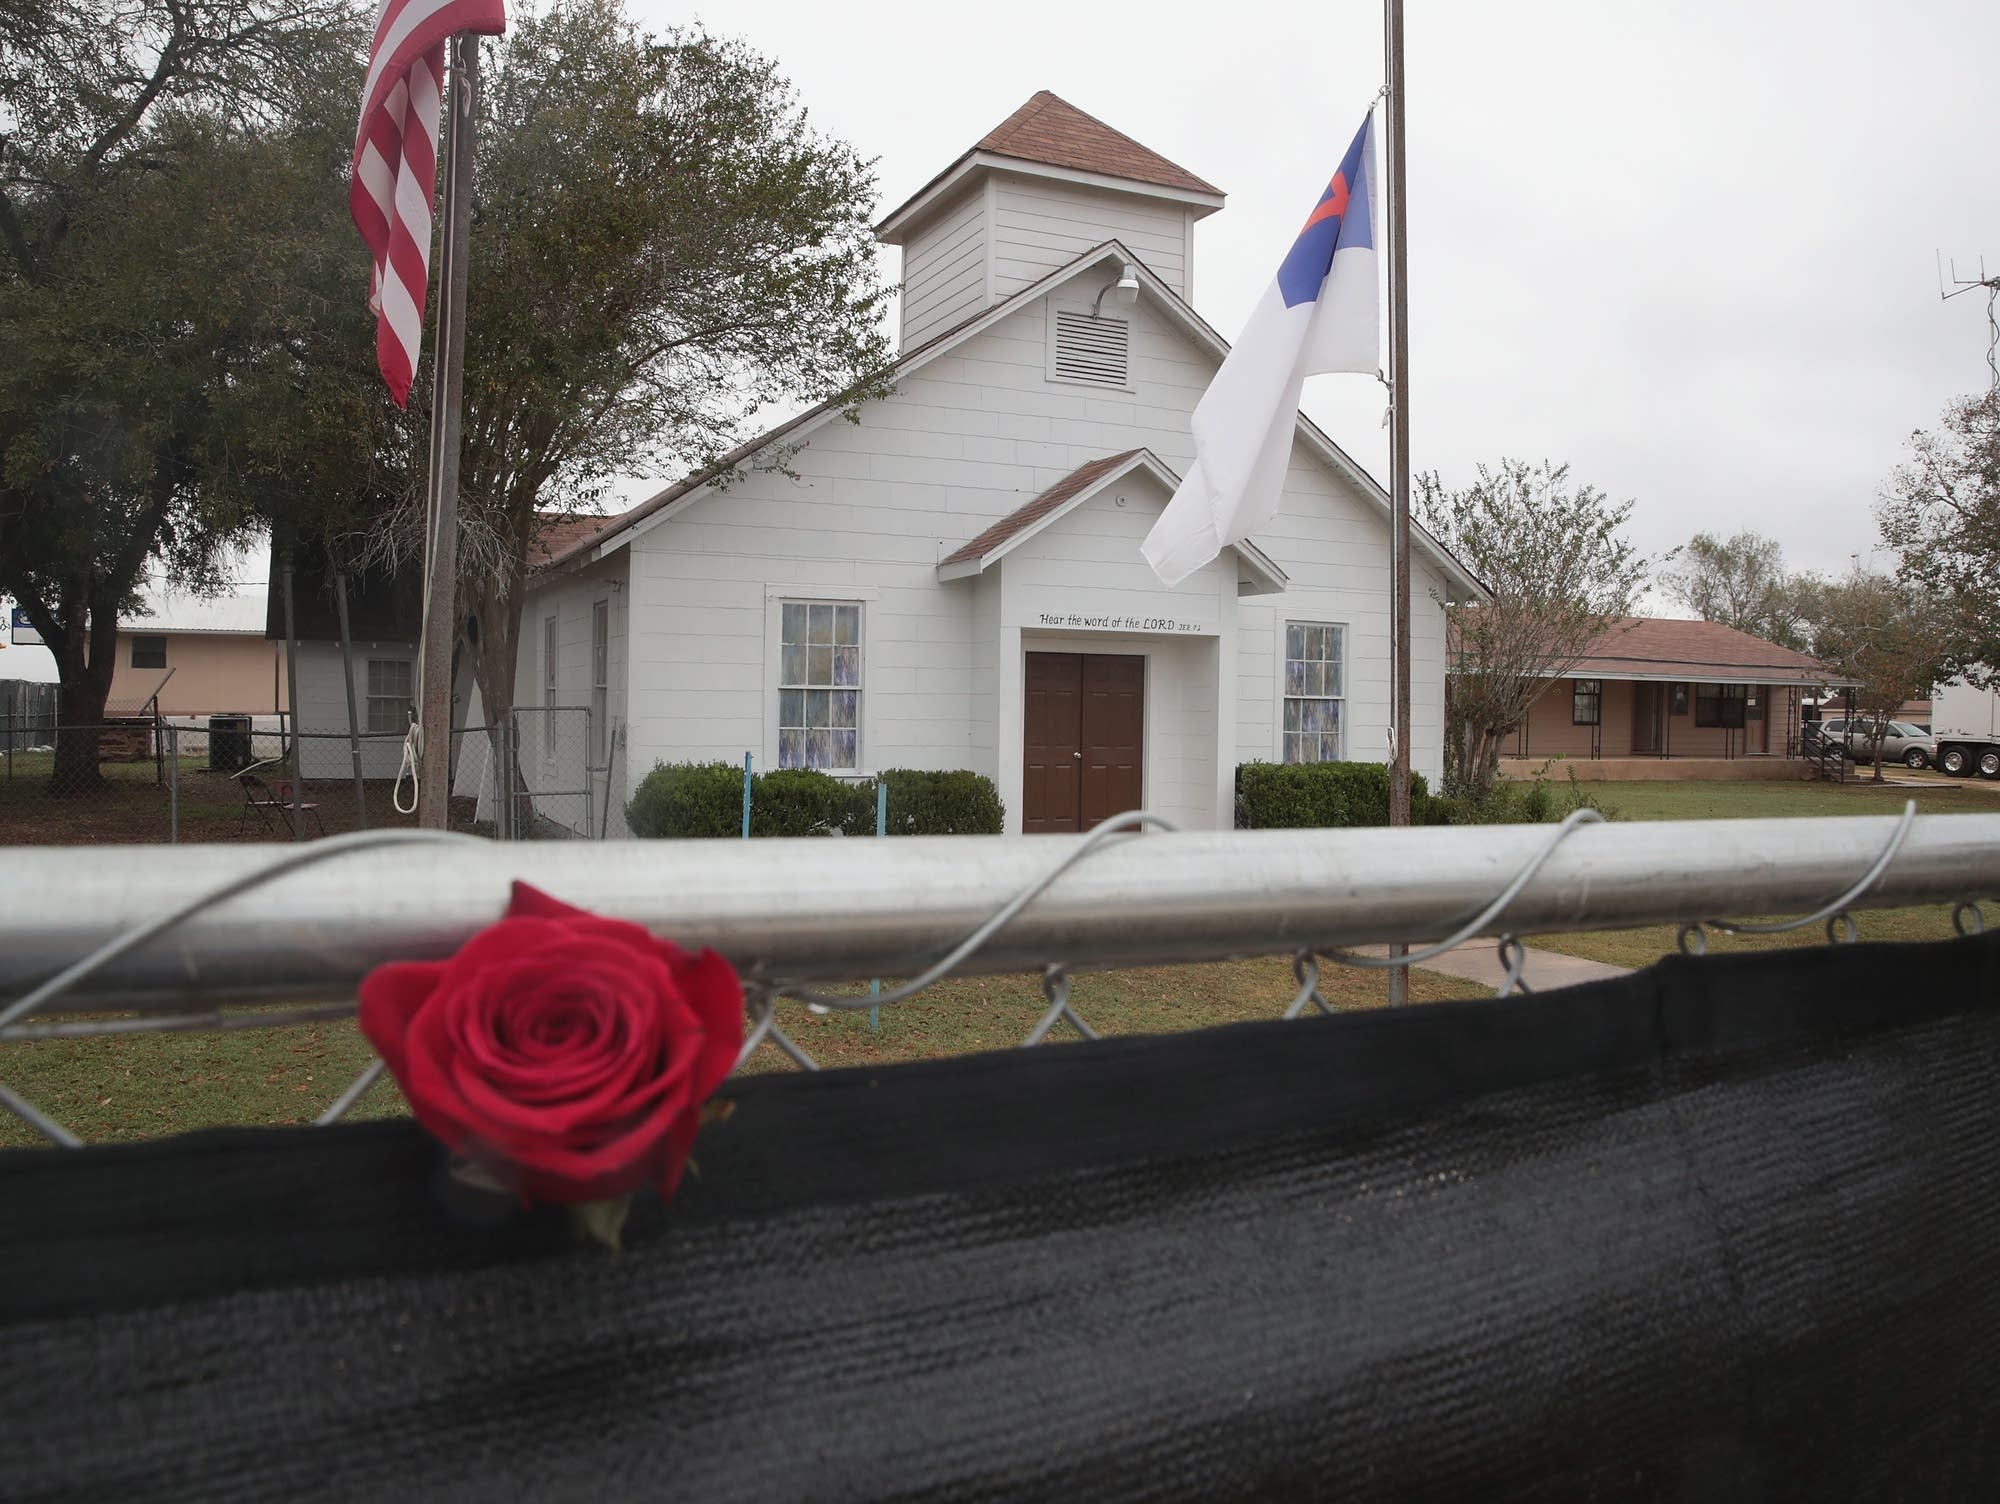 First Baptist Church opens to public, week after mass shooting